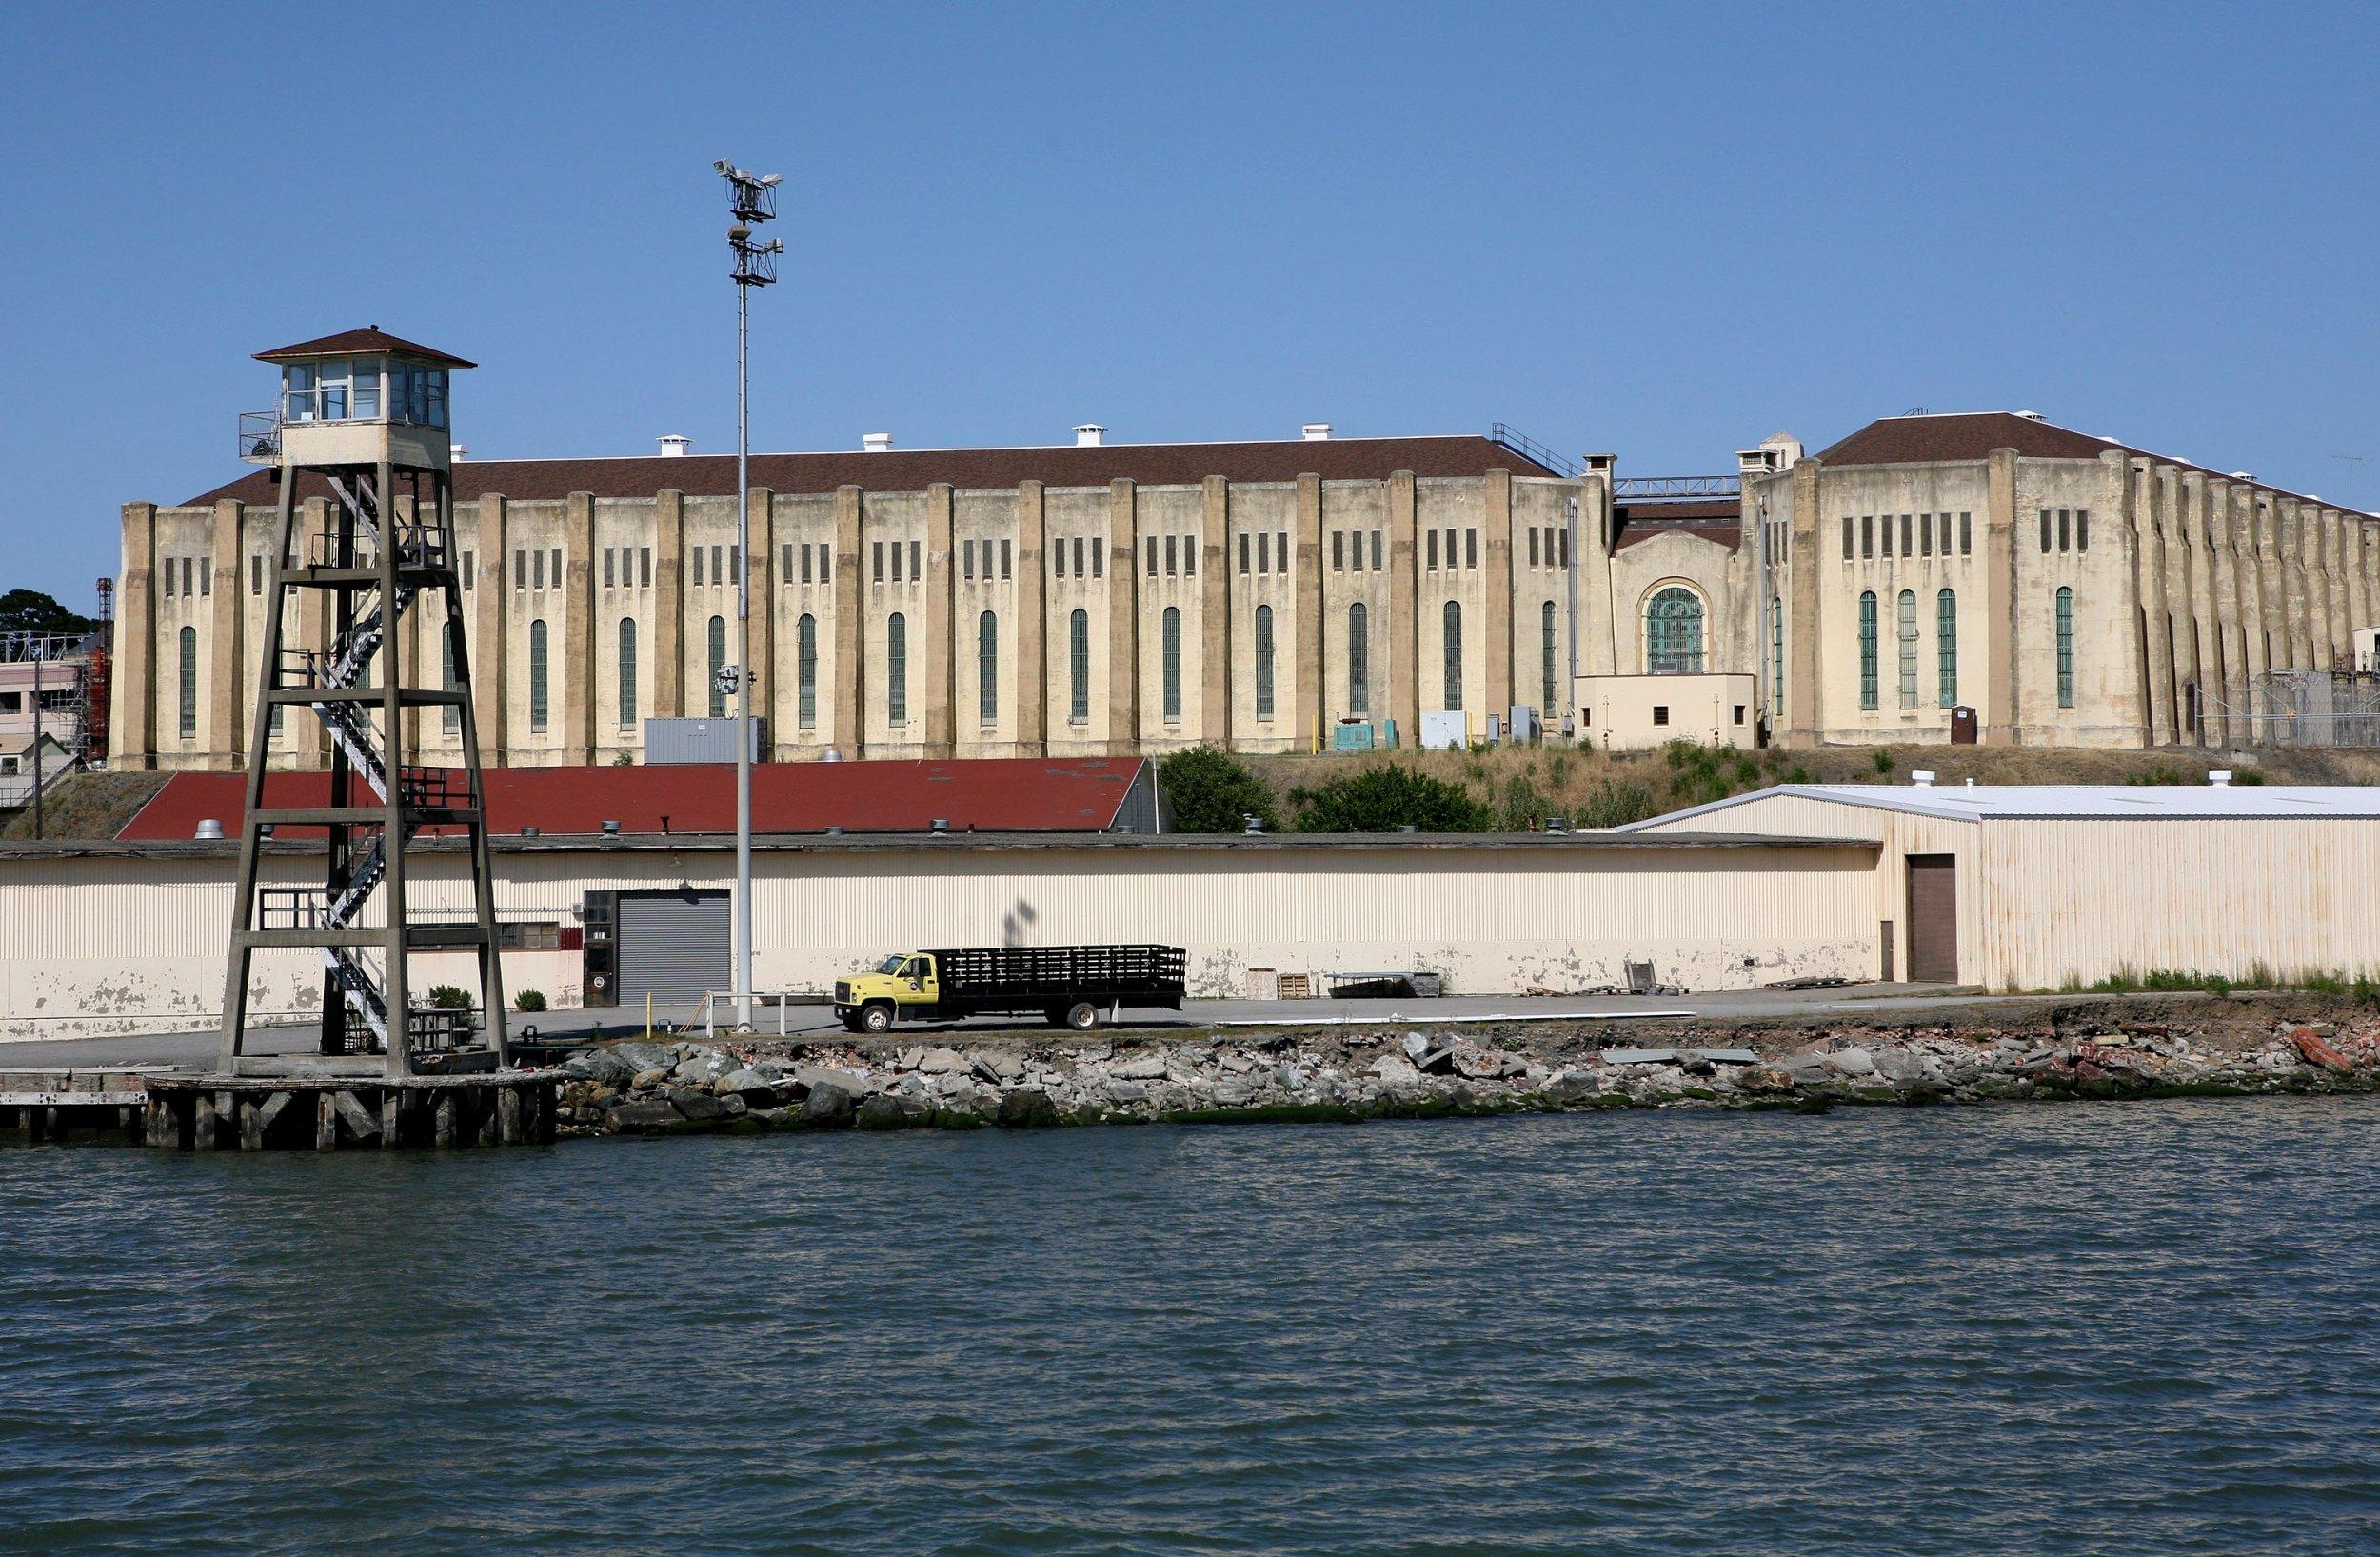 San-Quentin-Prisoner-Programmers-Recidivism-Rehabilitation-Last-Mile-87319587